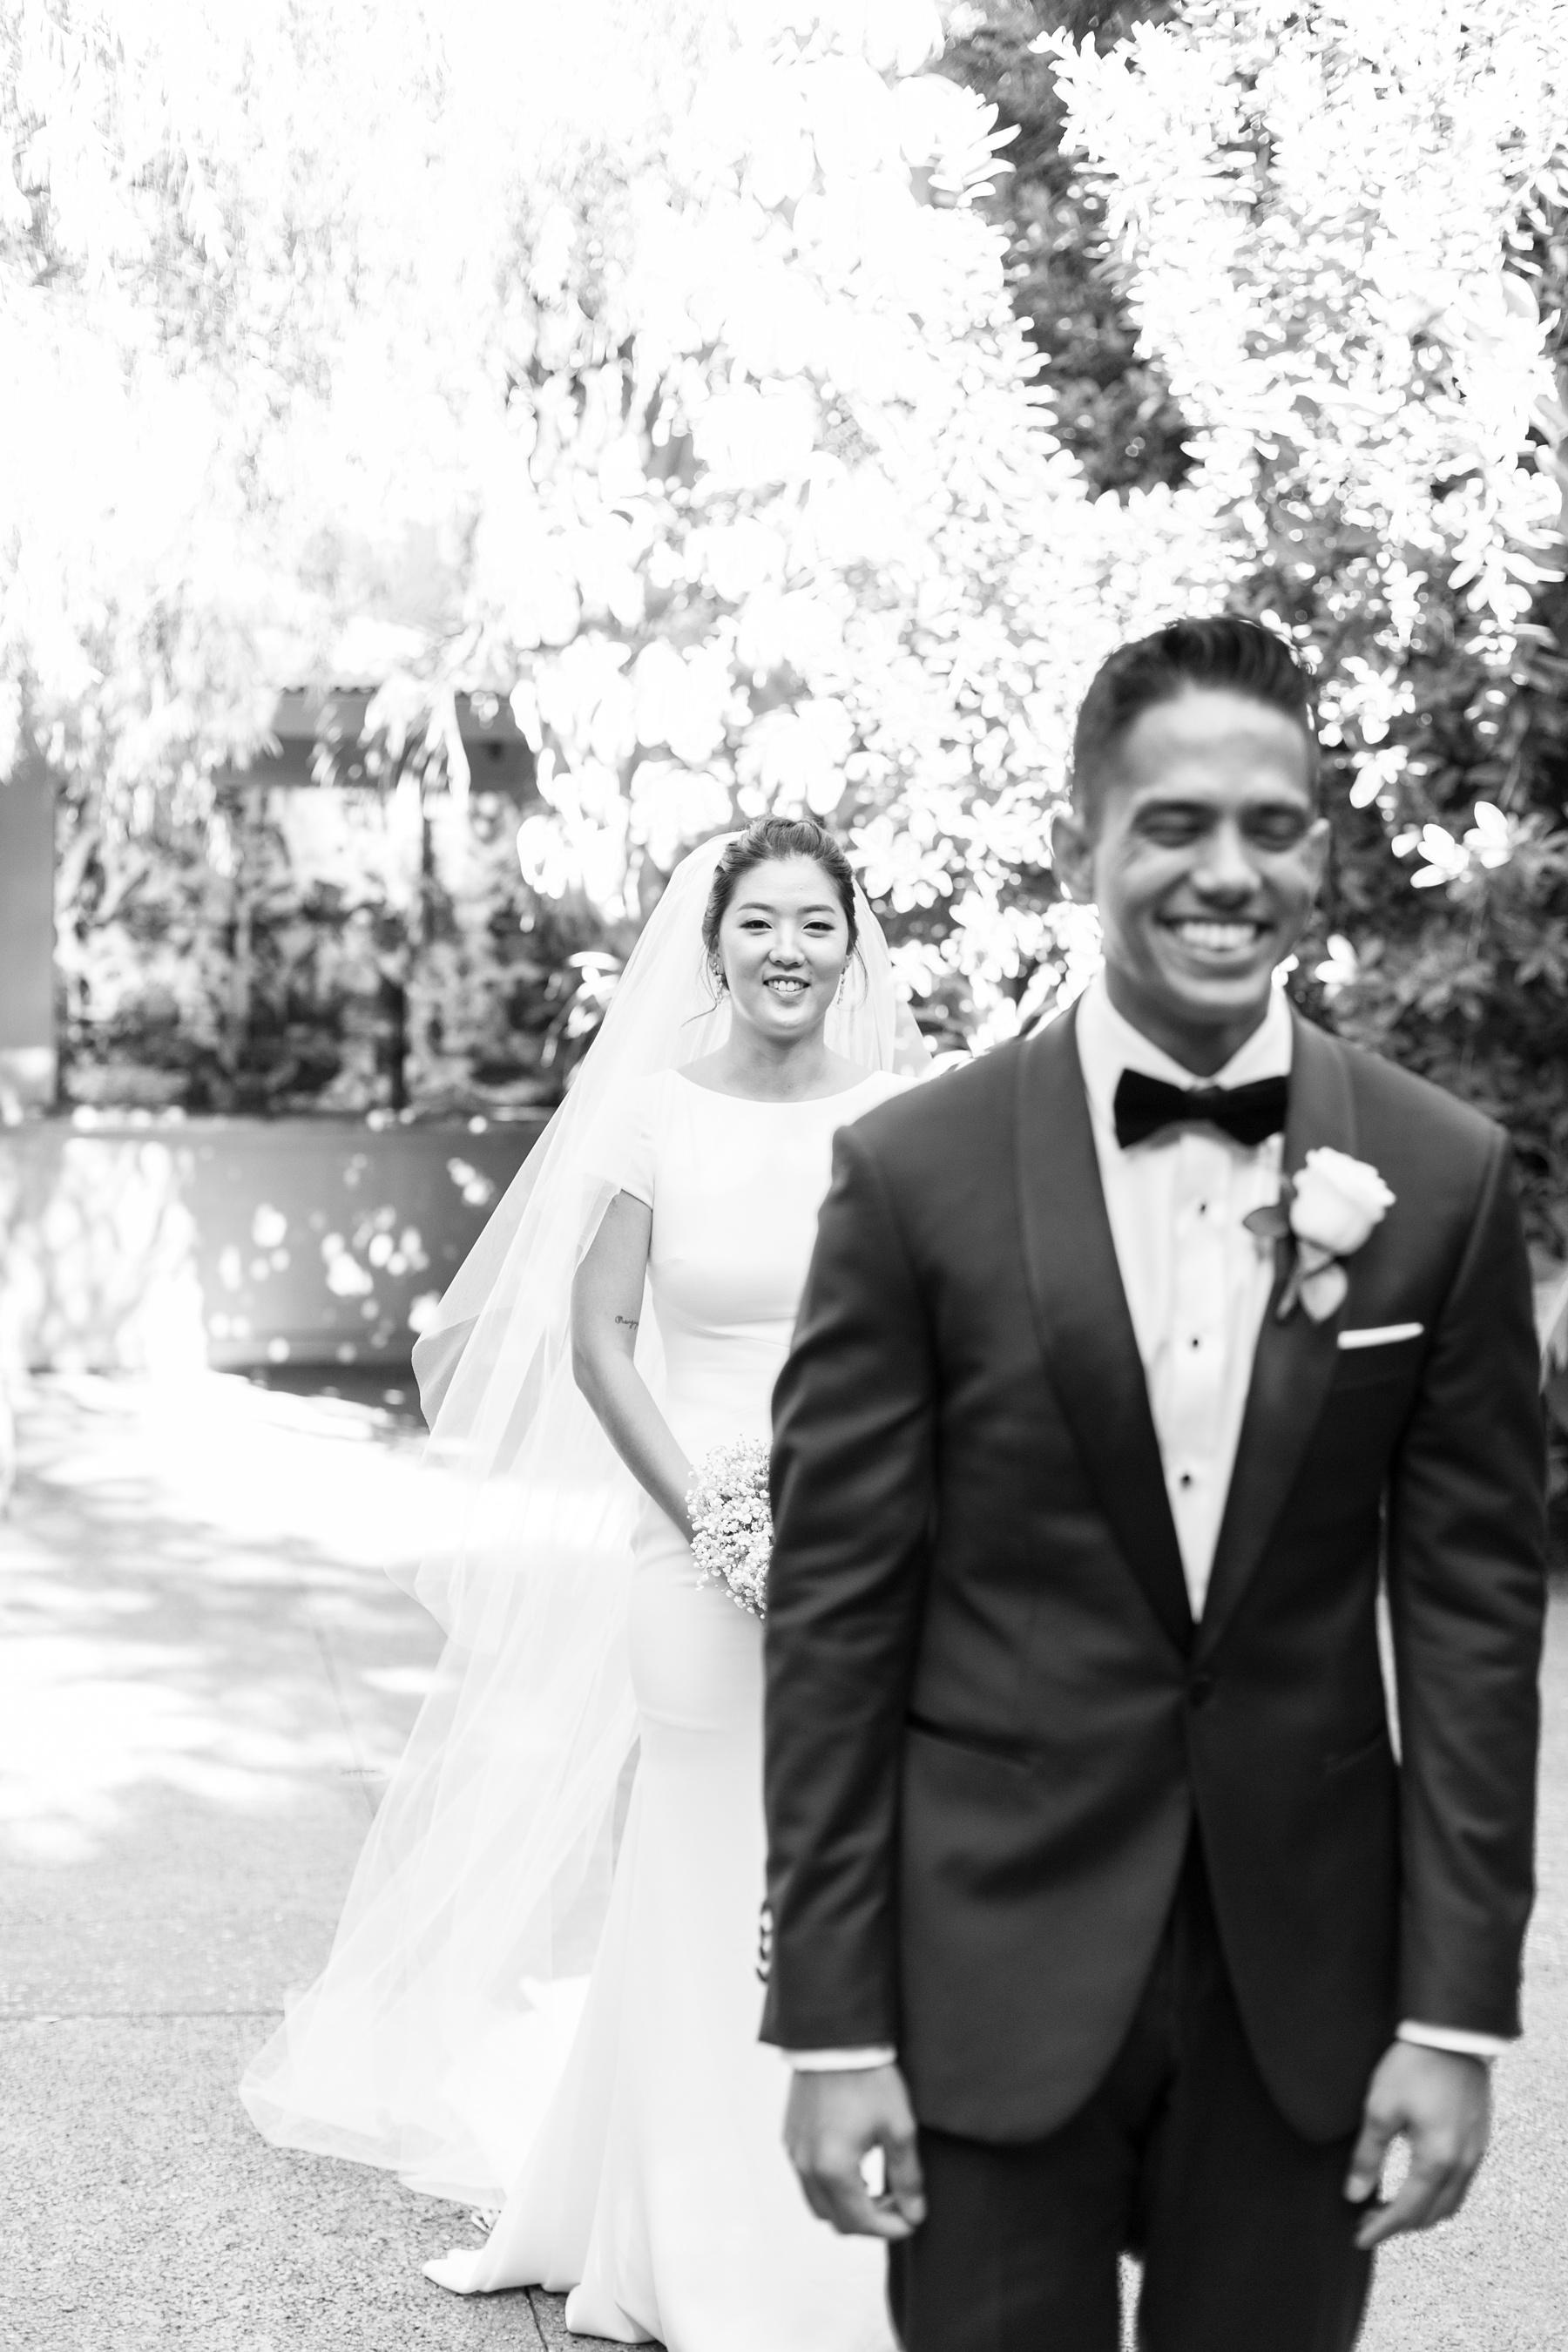 Urban DTLA Wedding at Millwick By Wedding Photographer Madison Ellis (5)